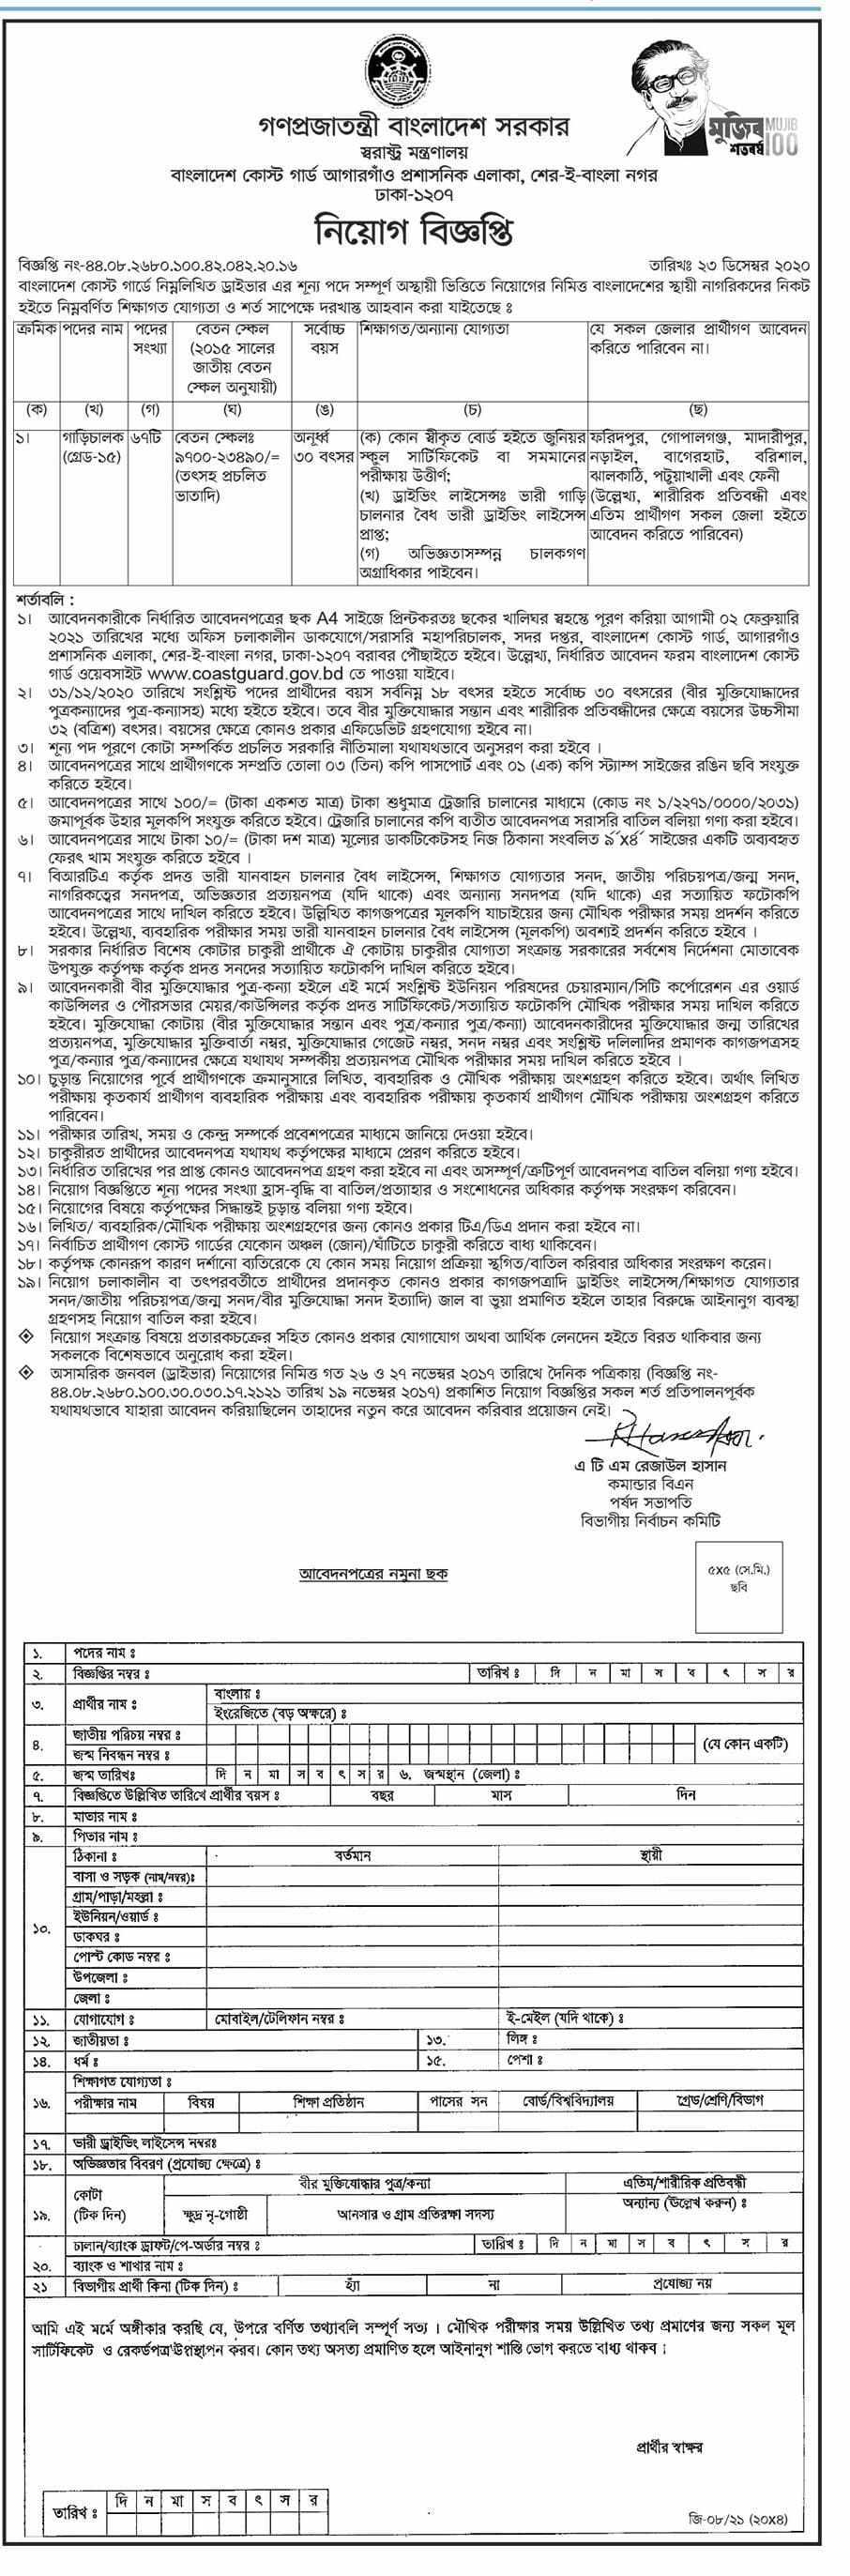 ministry-of-home-affairs-job-circular-2021